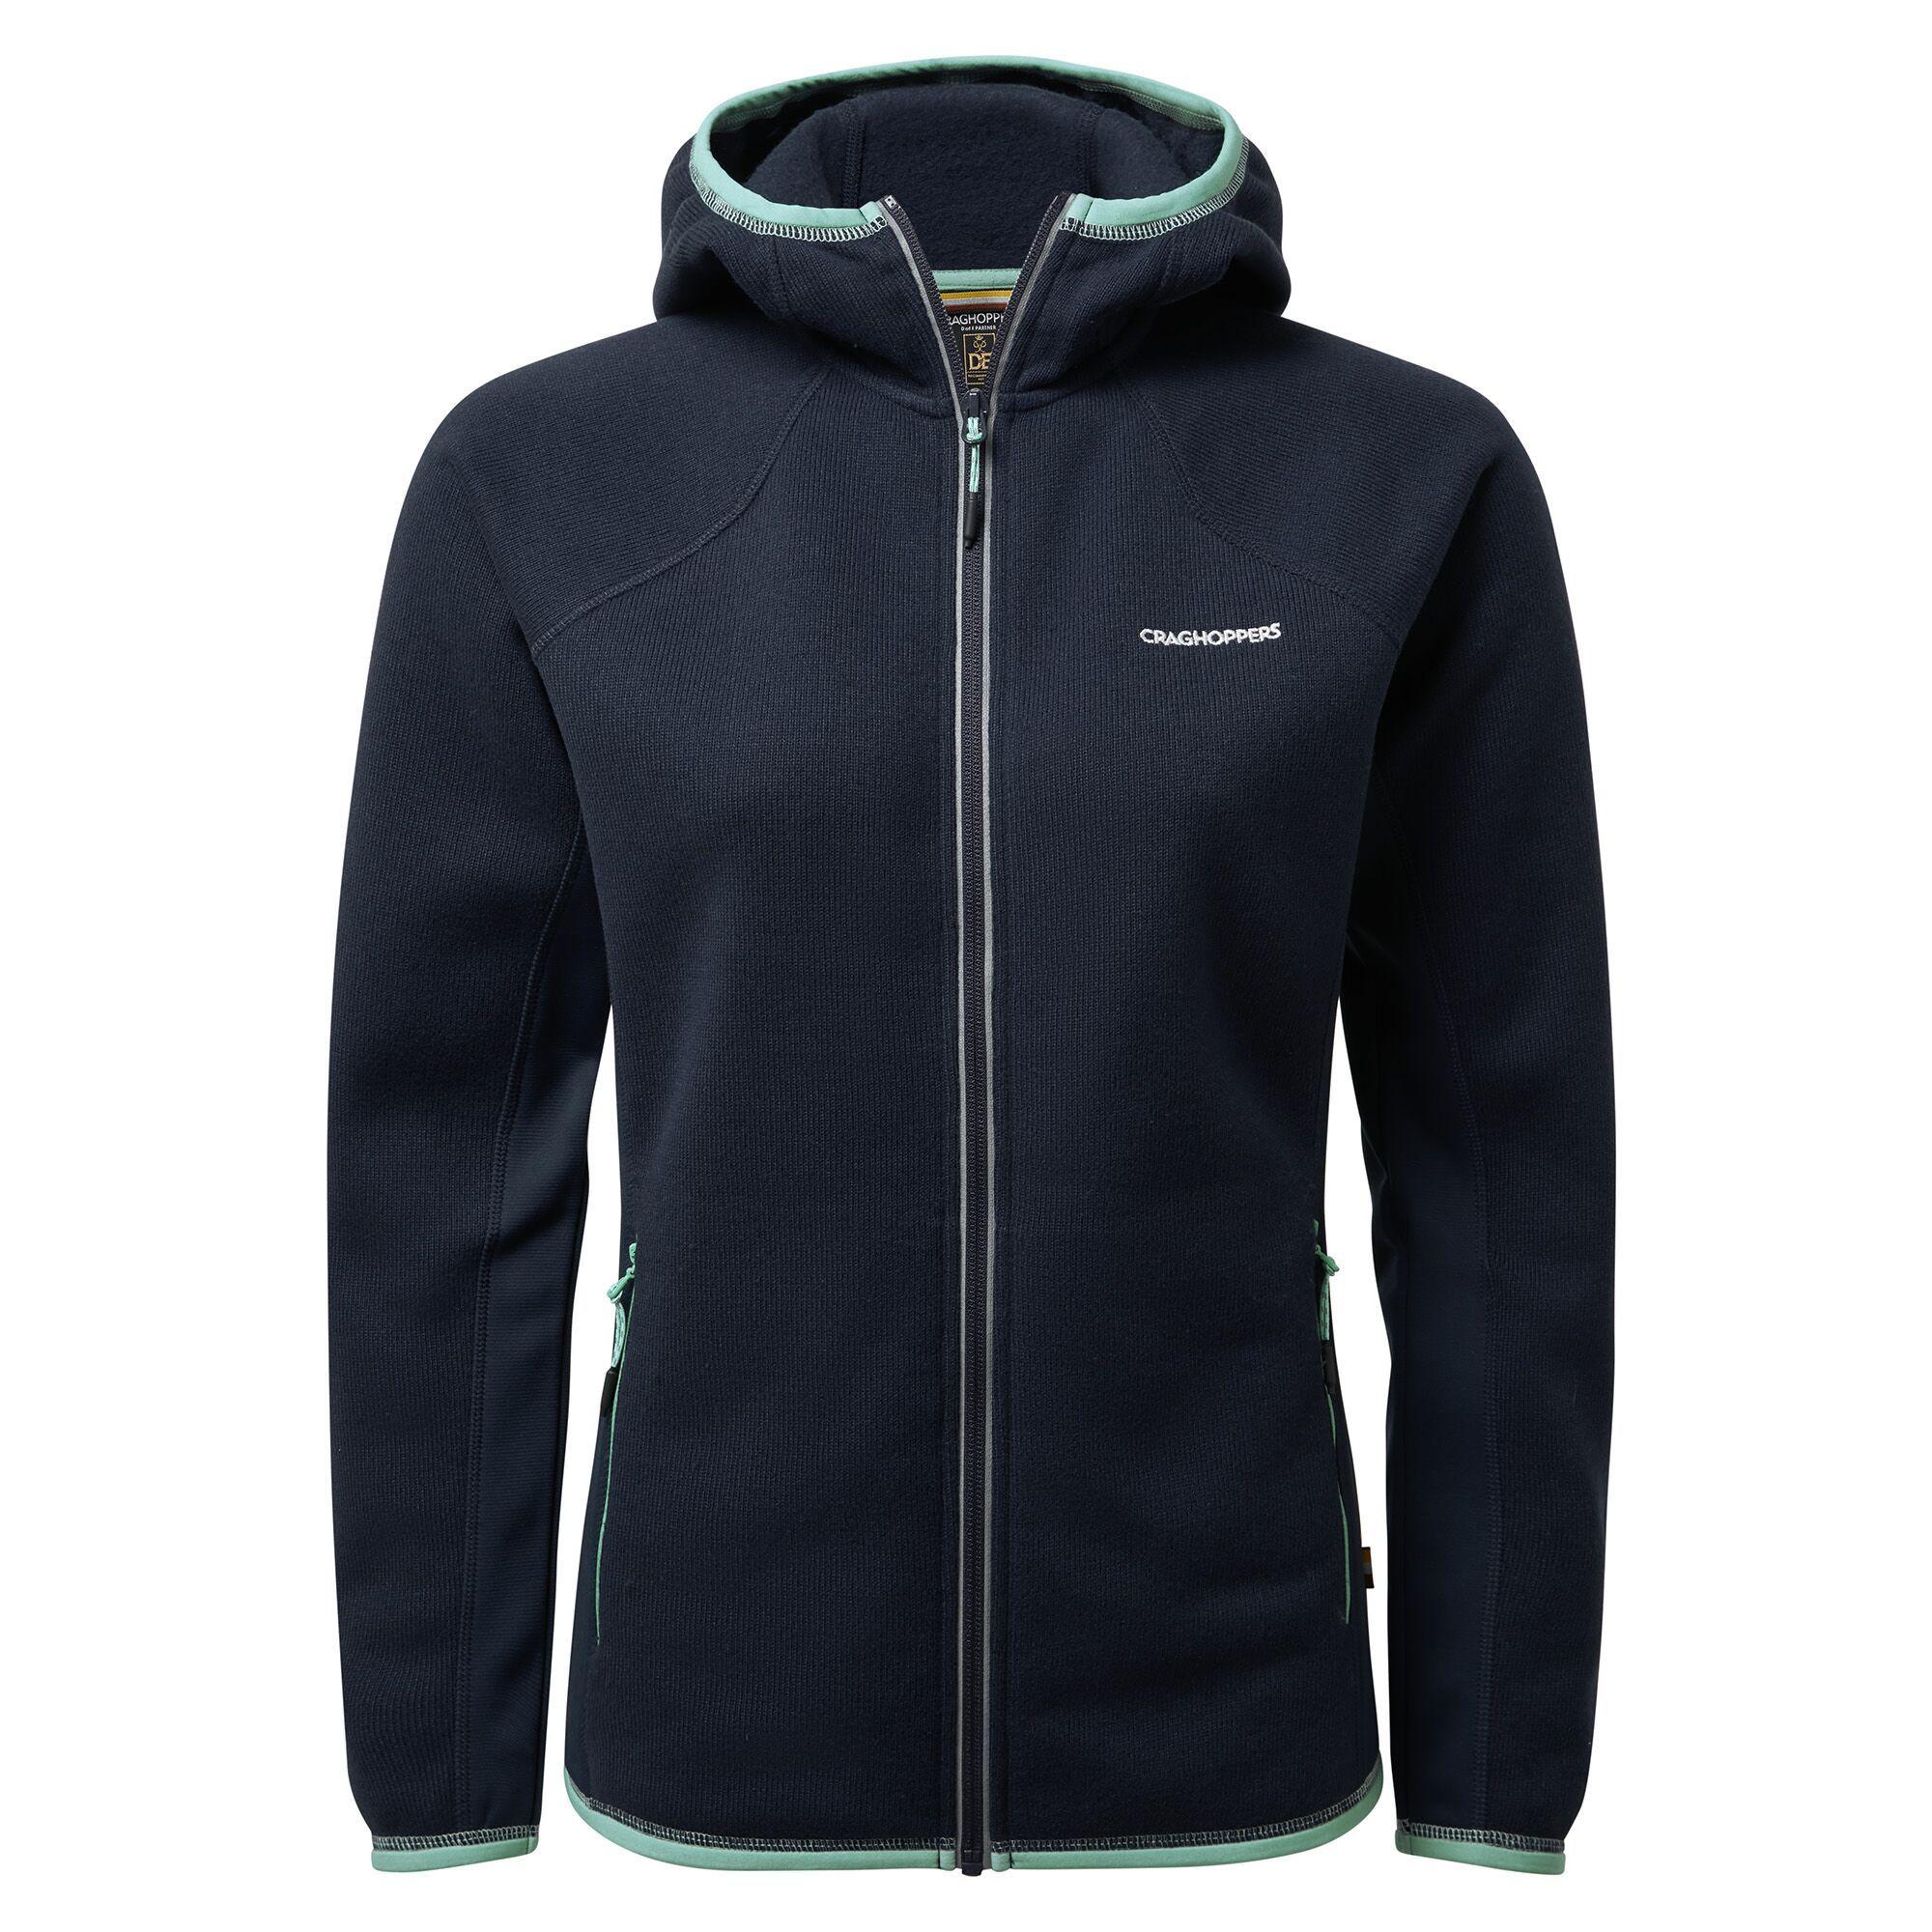 Craghoppers Womens/Ladies Mannix Jacket (16 UK) (Blue Navy)